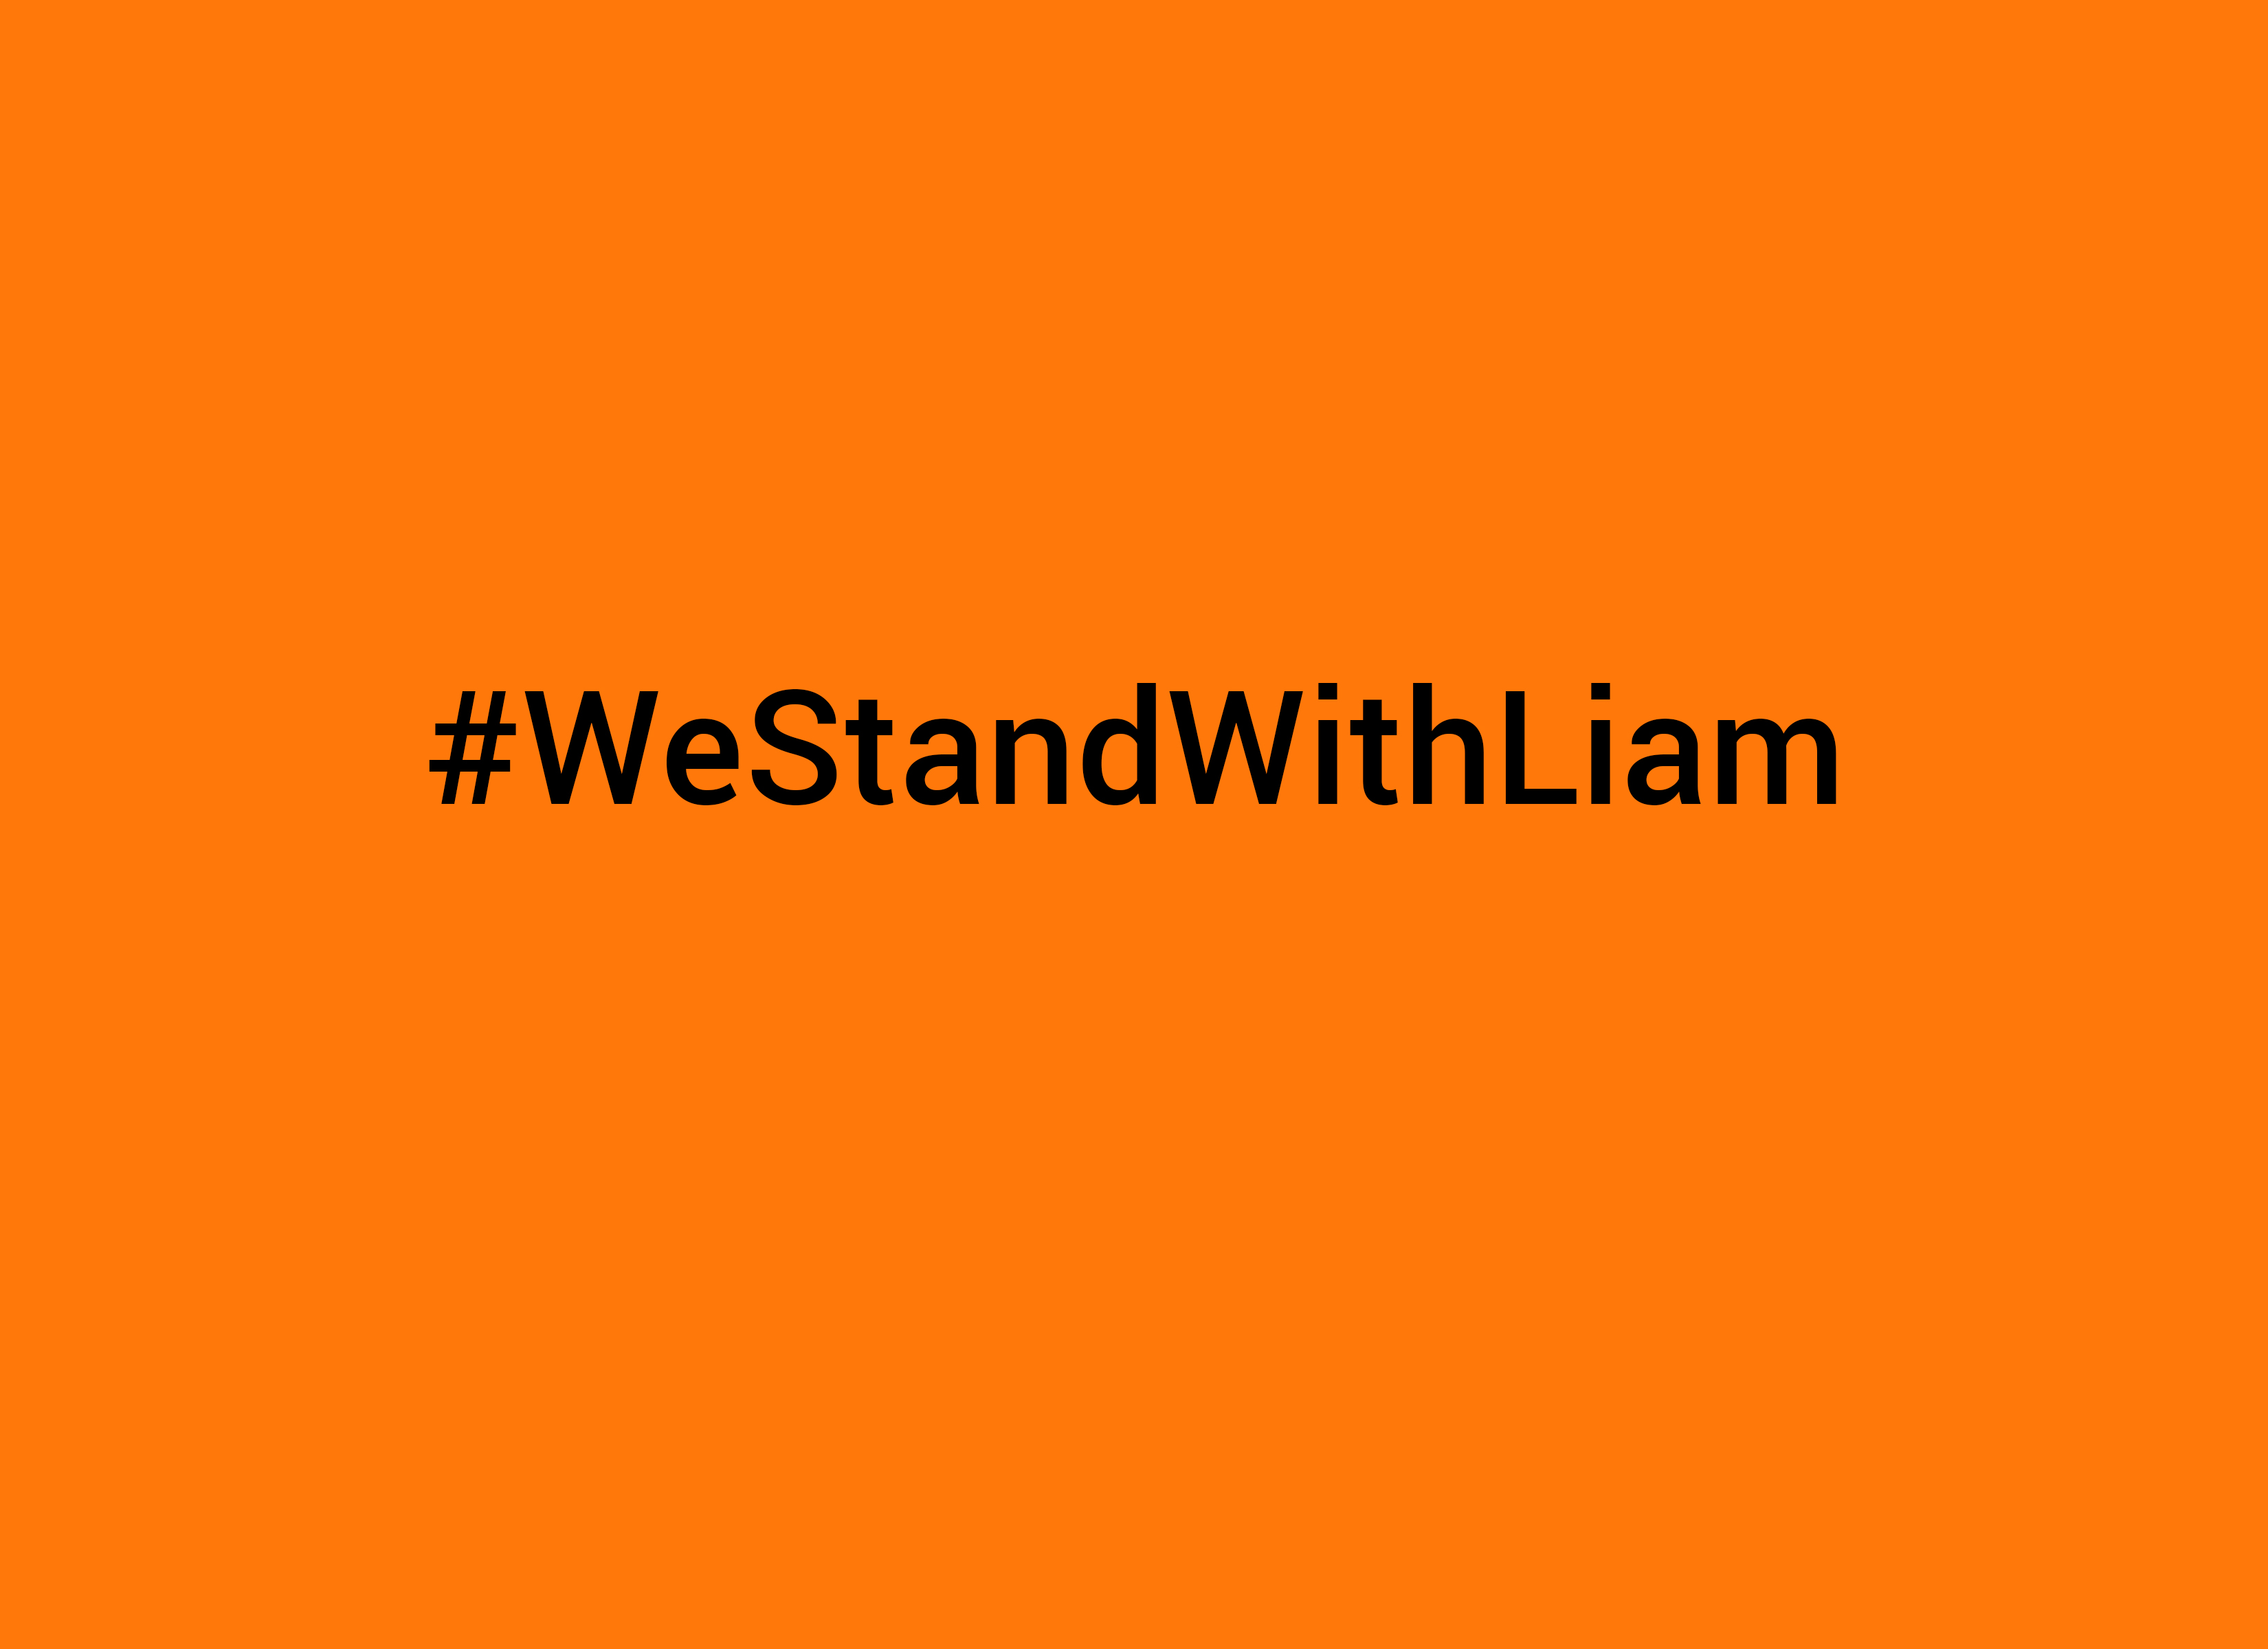 #WeStandWithLiam